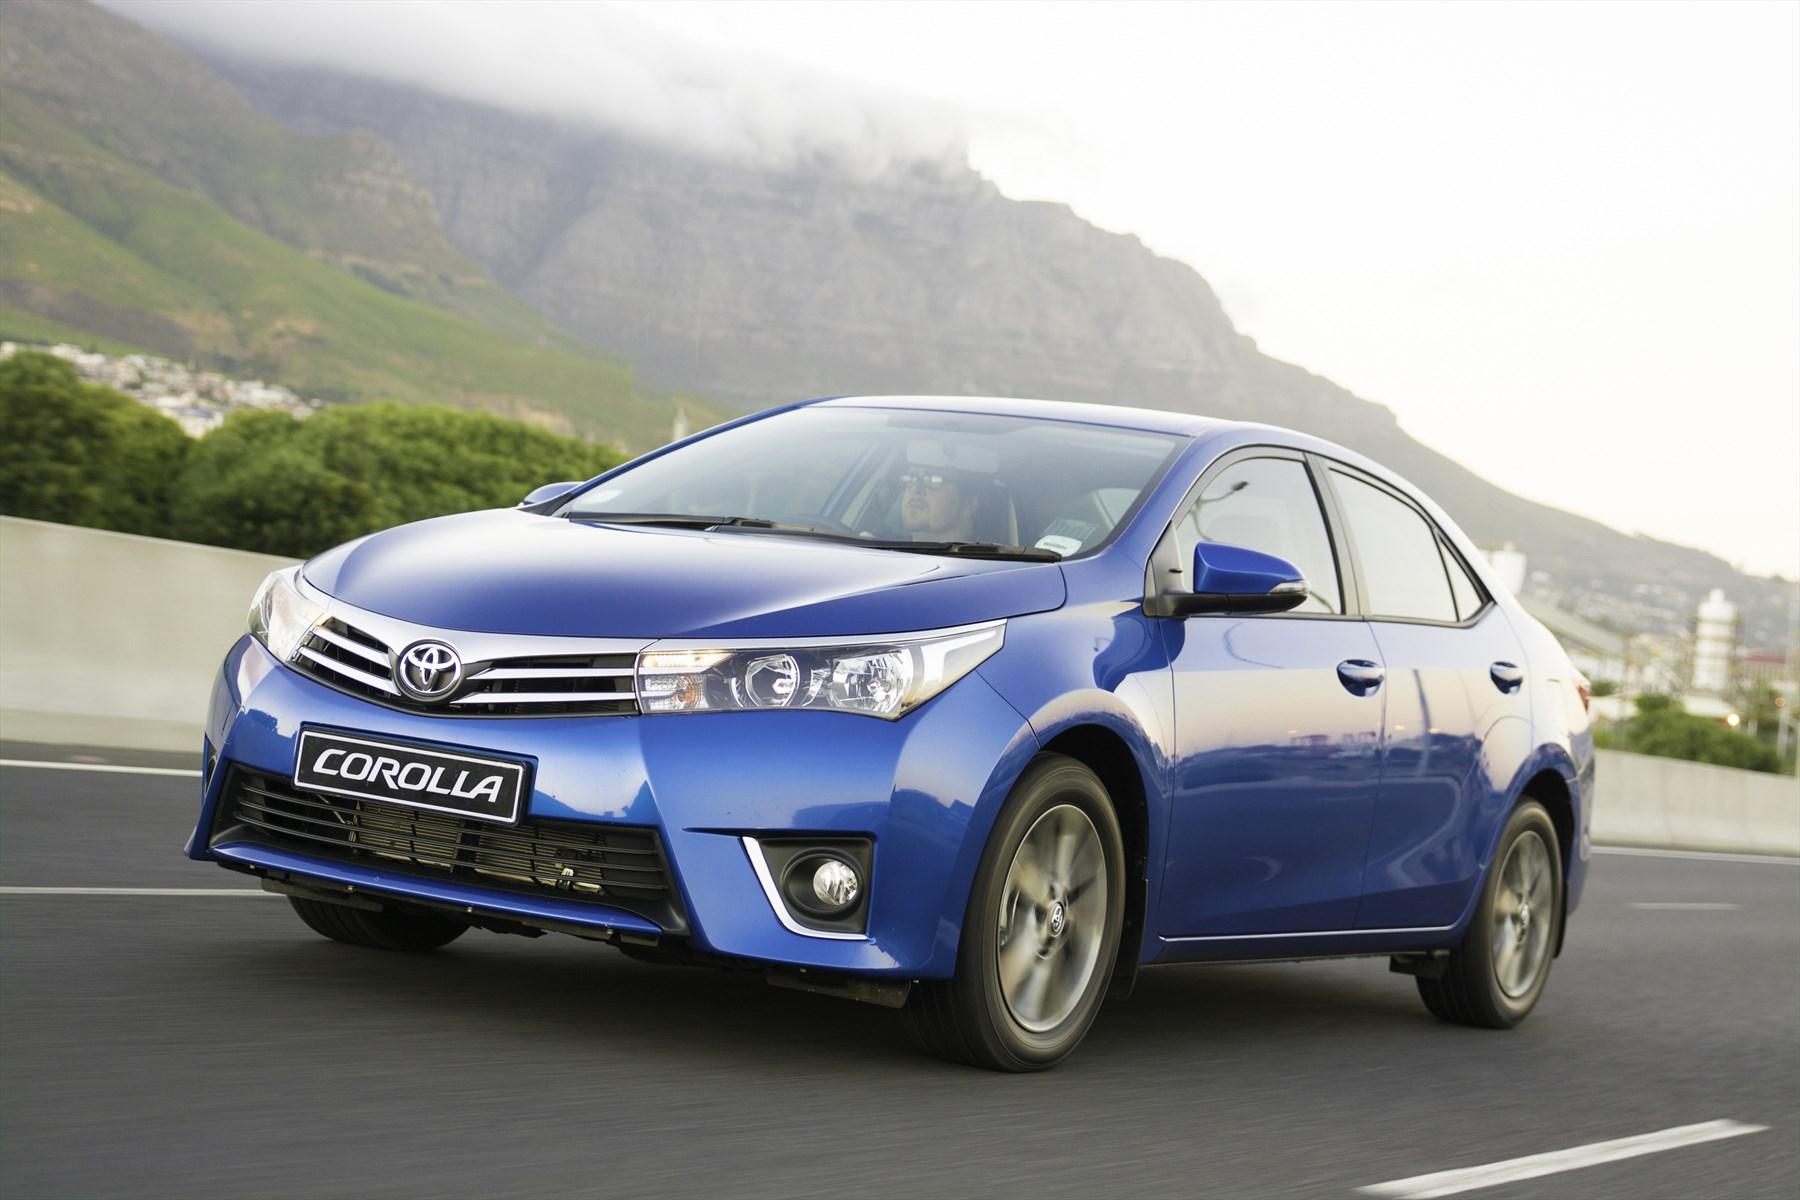 Toyota Corolla (Photo: Quickpic)